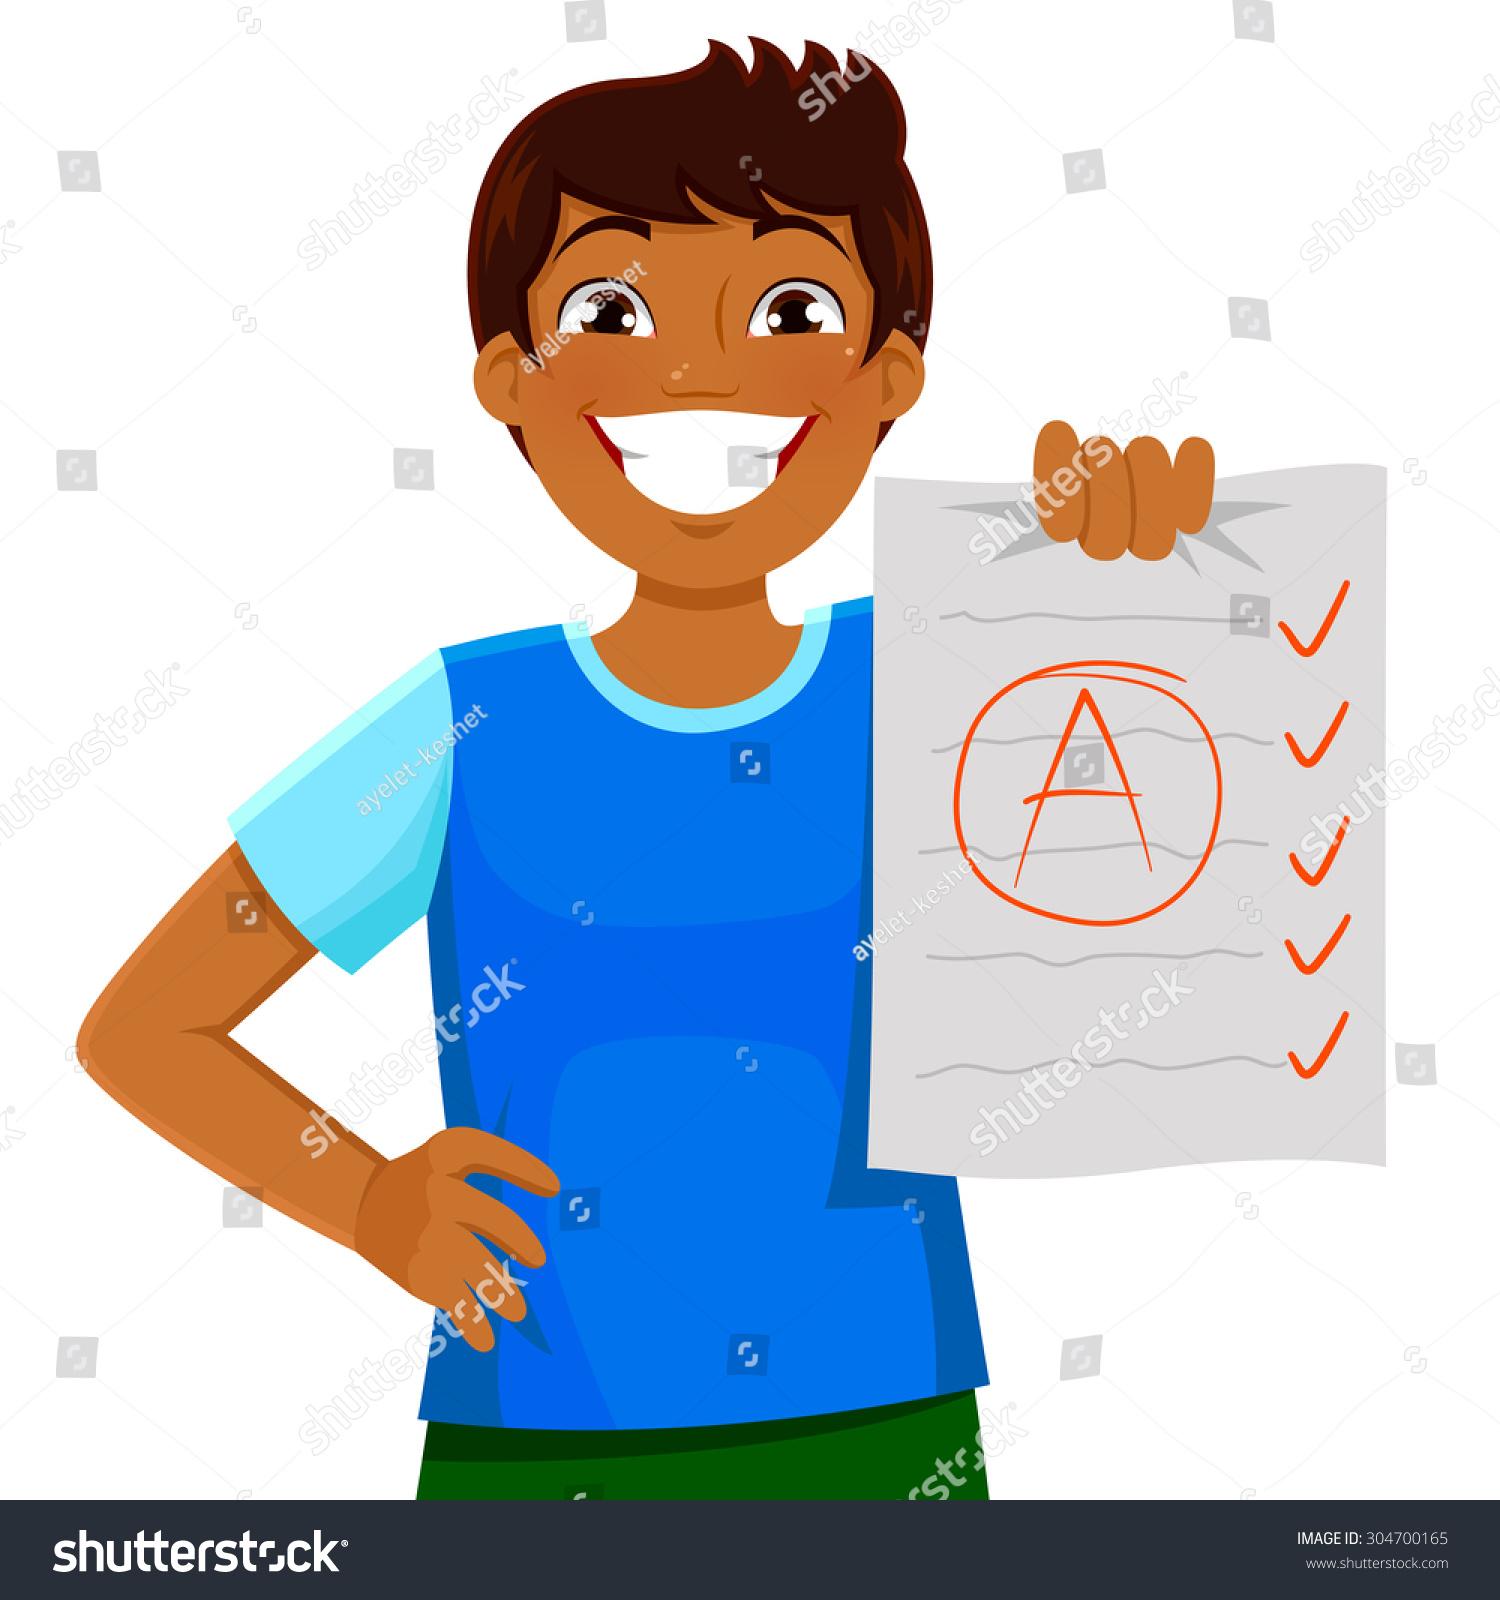 accuplacer essay score 8